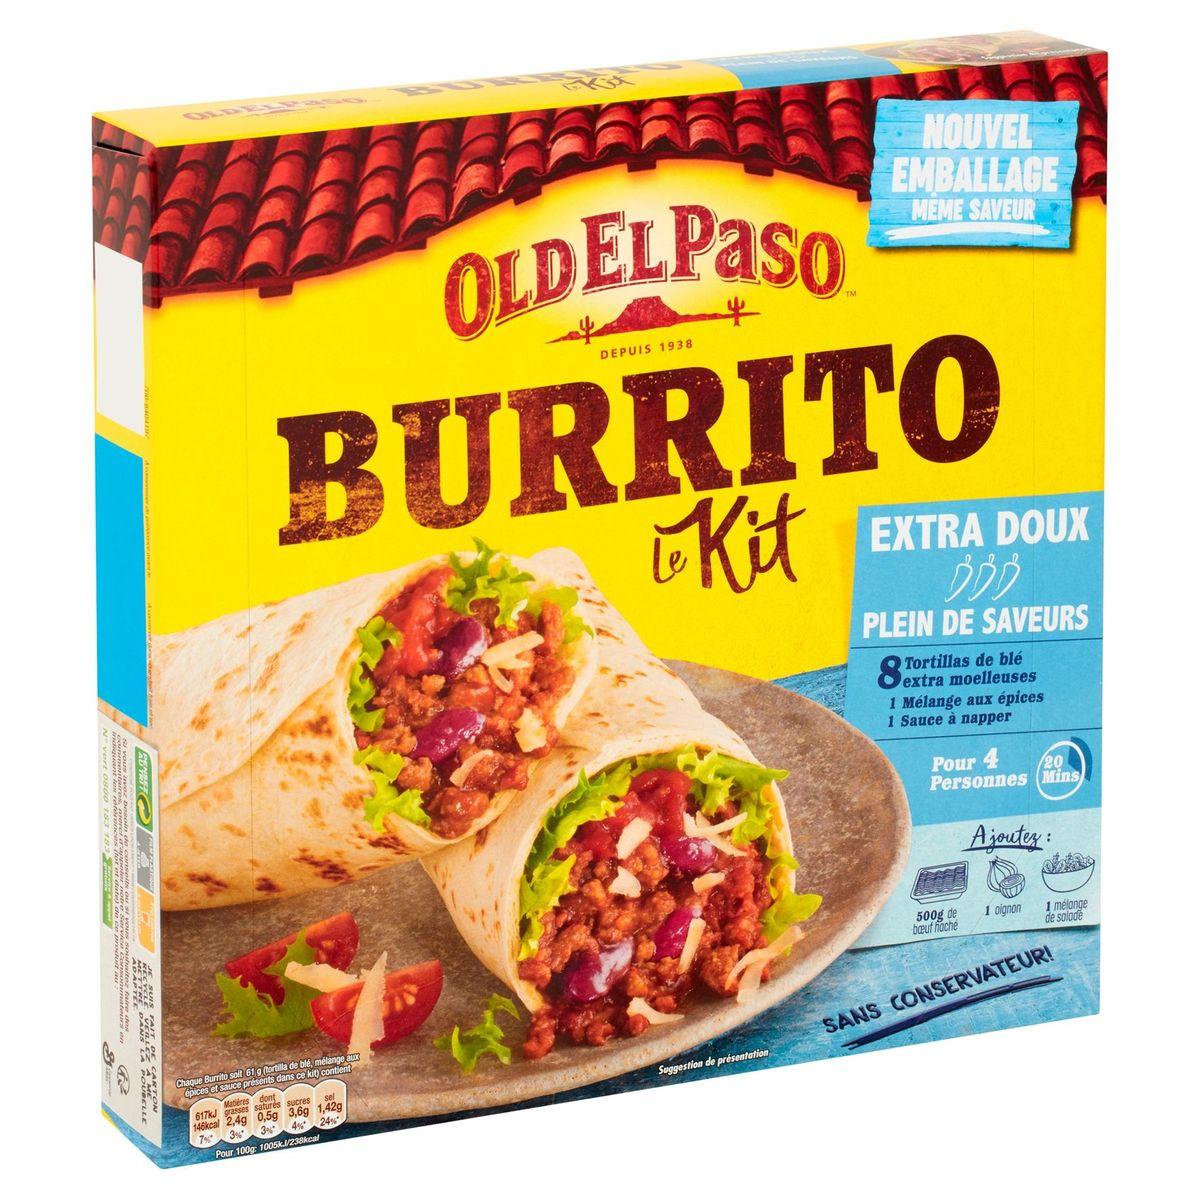 Old El Paso Burrito Le Kit Extra Doux 491 g